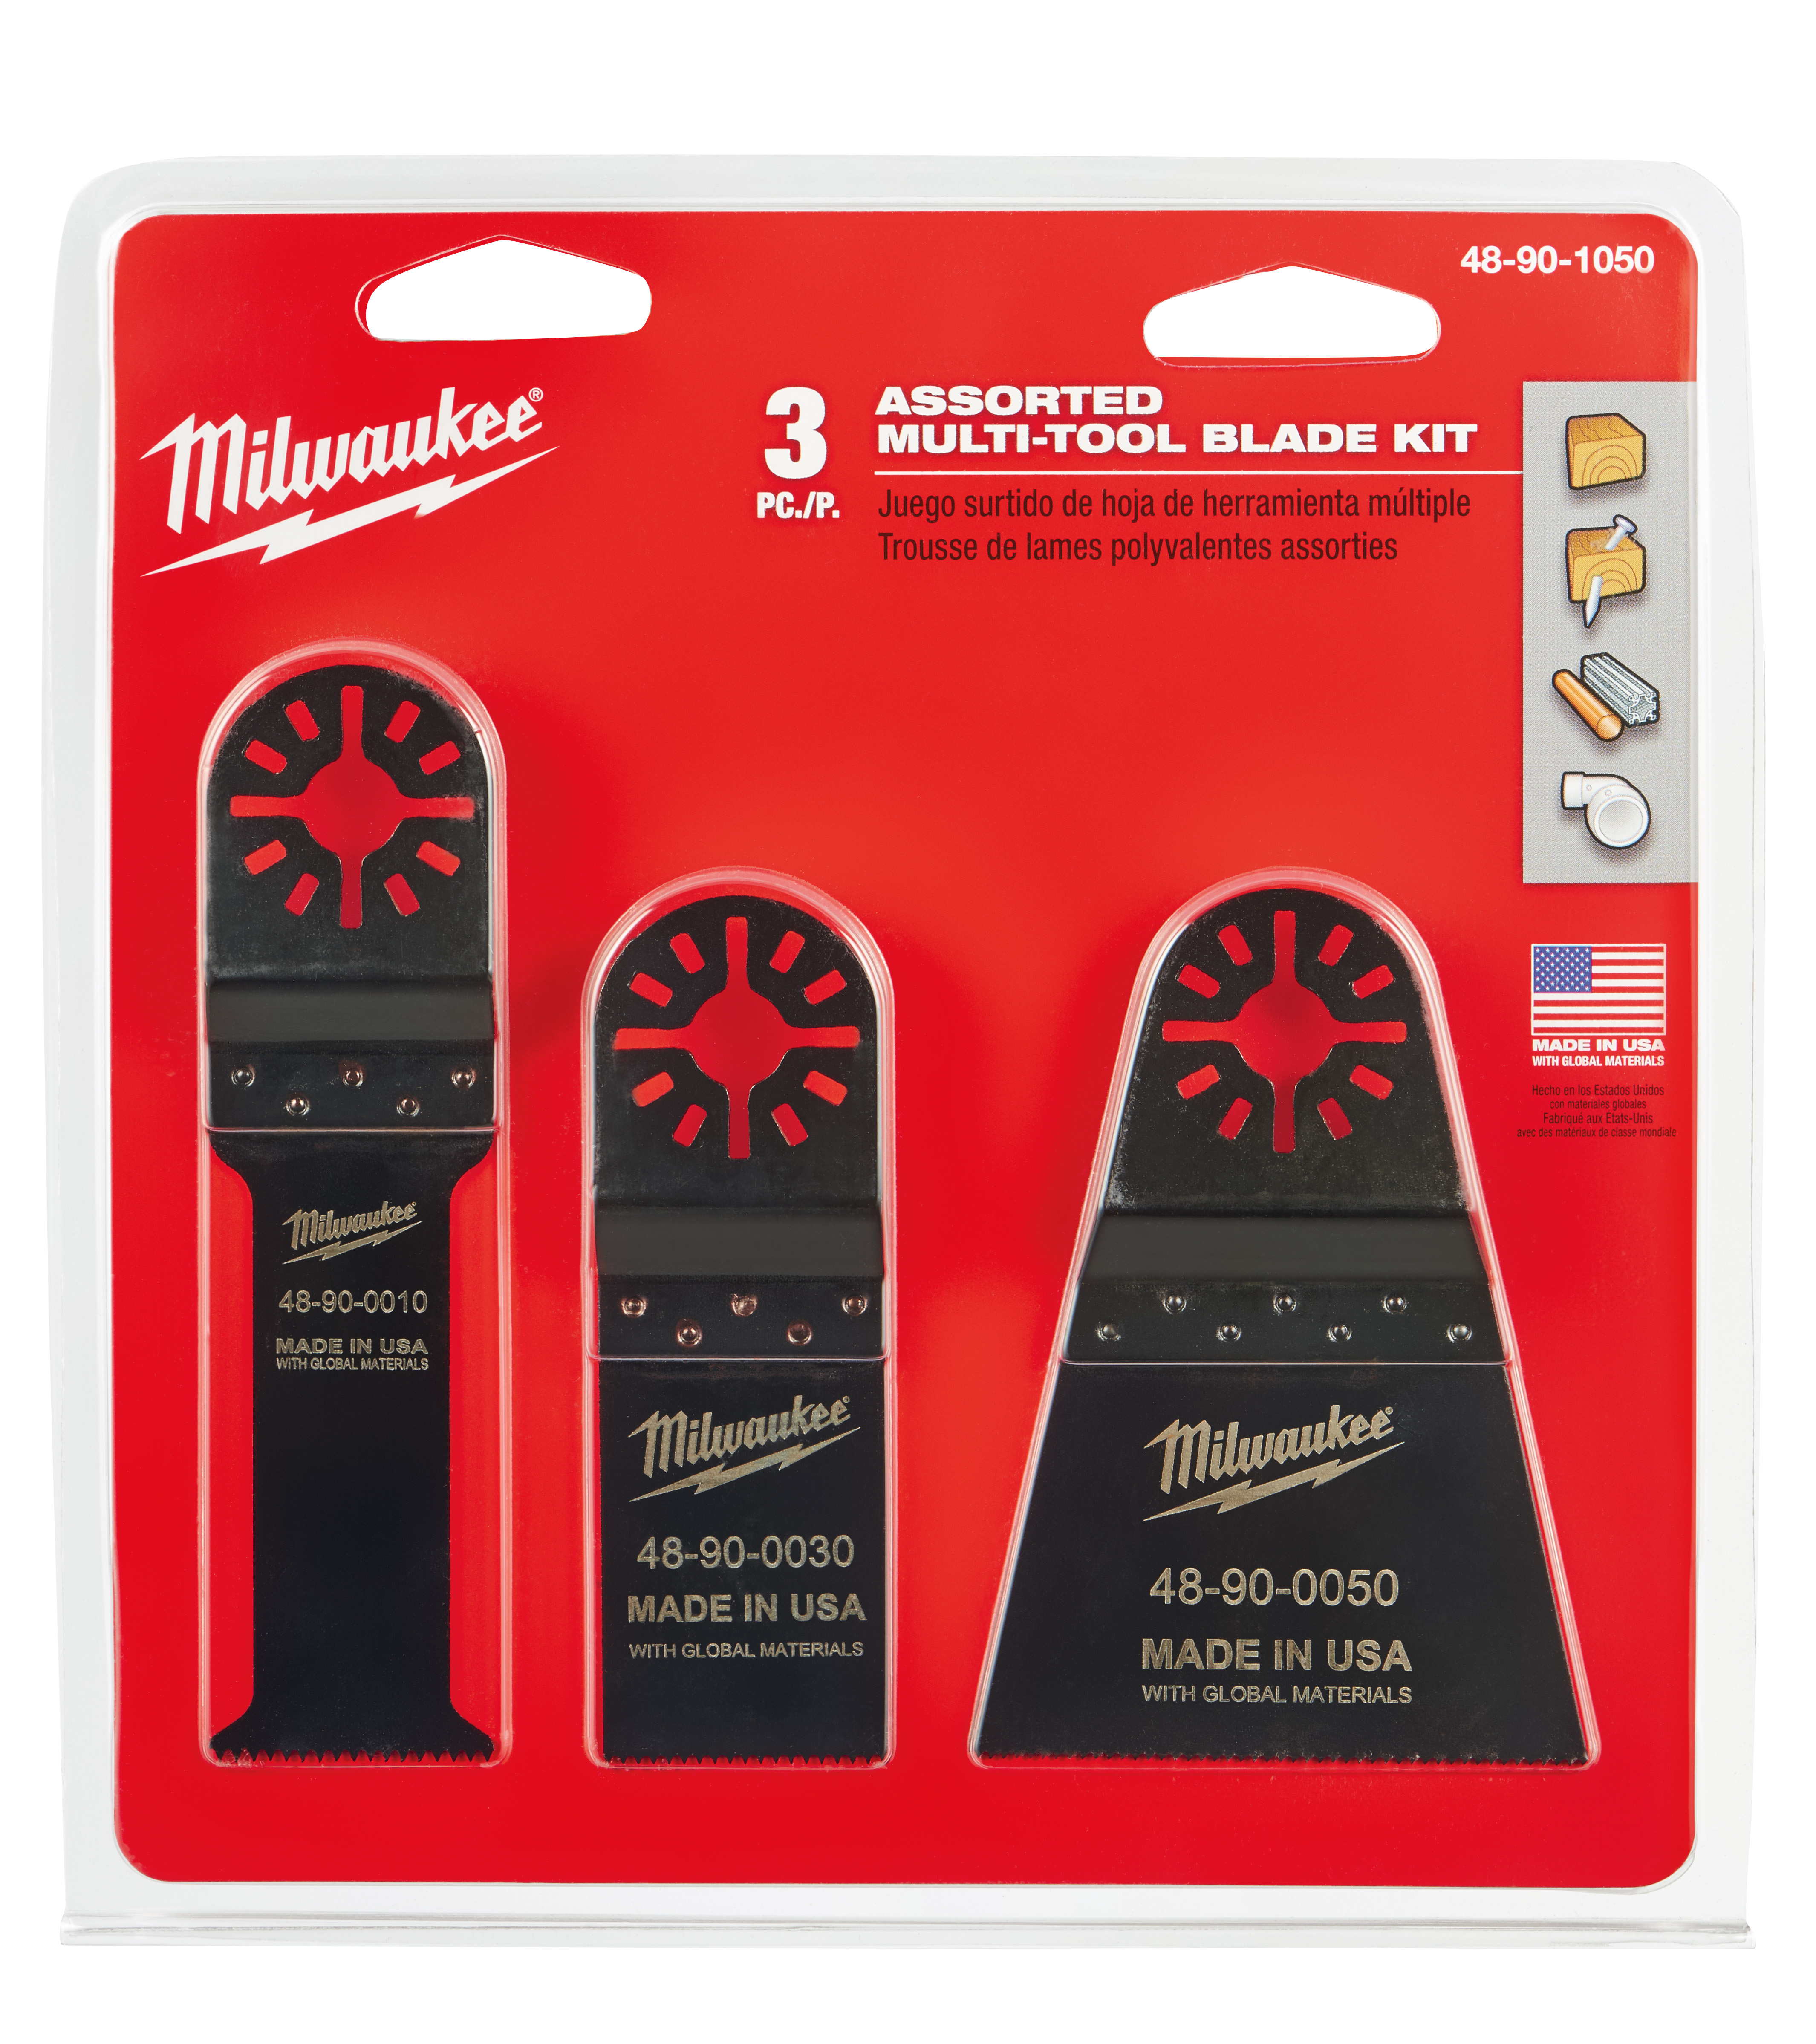 Milwaukee® 48-90-0050 Multi-Tool Blade, For Use With Oscillating Tool, 2-1/2 in Dia Cutting, Bi-Metal